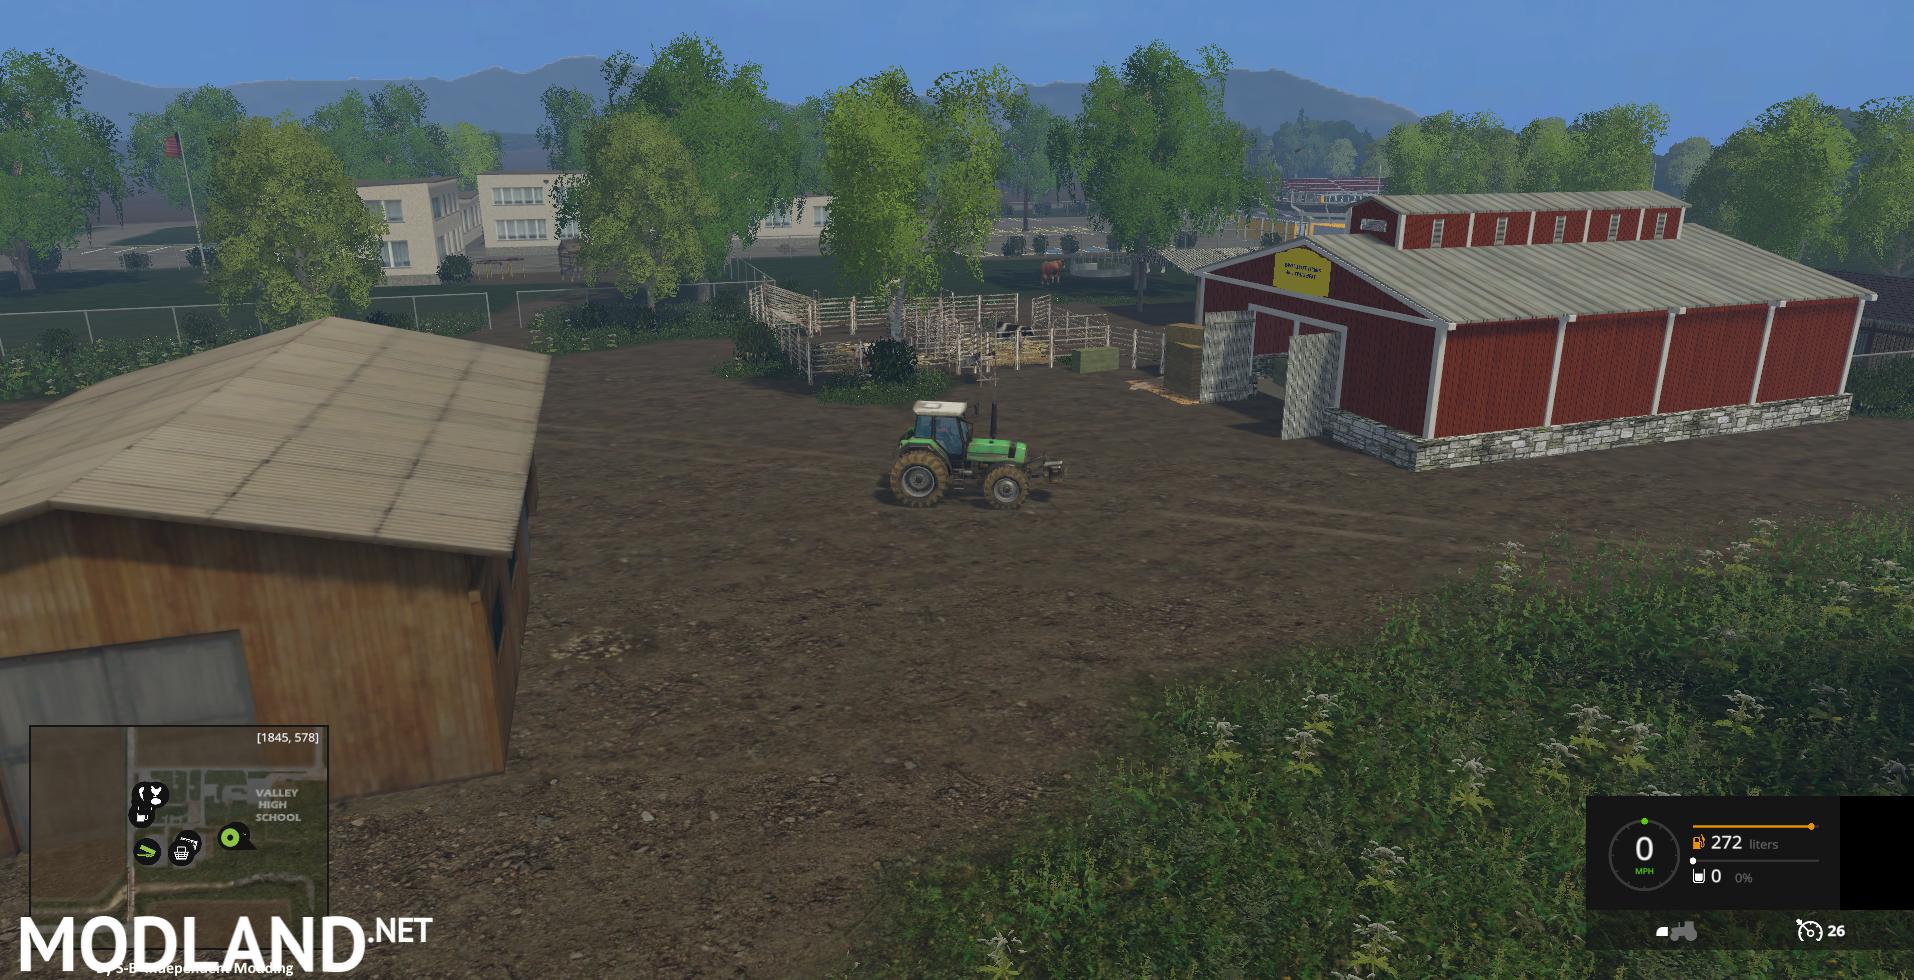 VALLEY EAST USA [CONTEST 2015] MOD mod for Farming Simulator